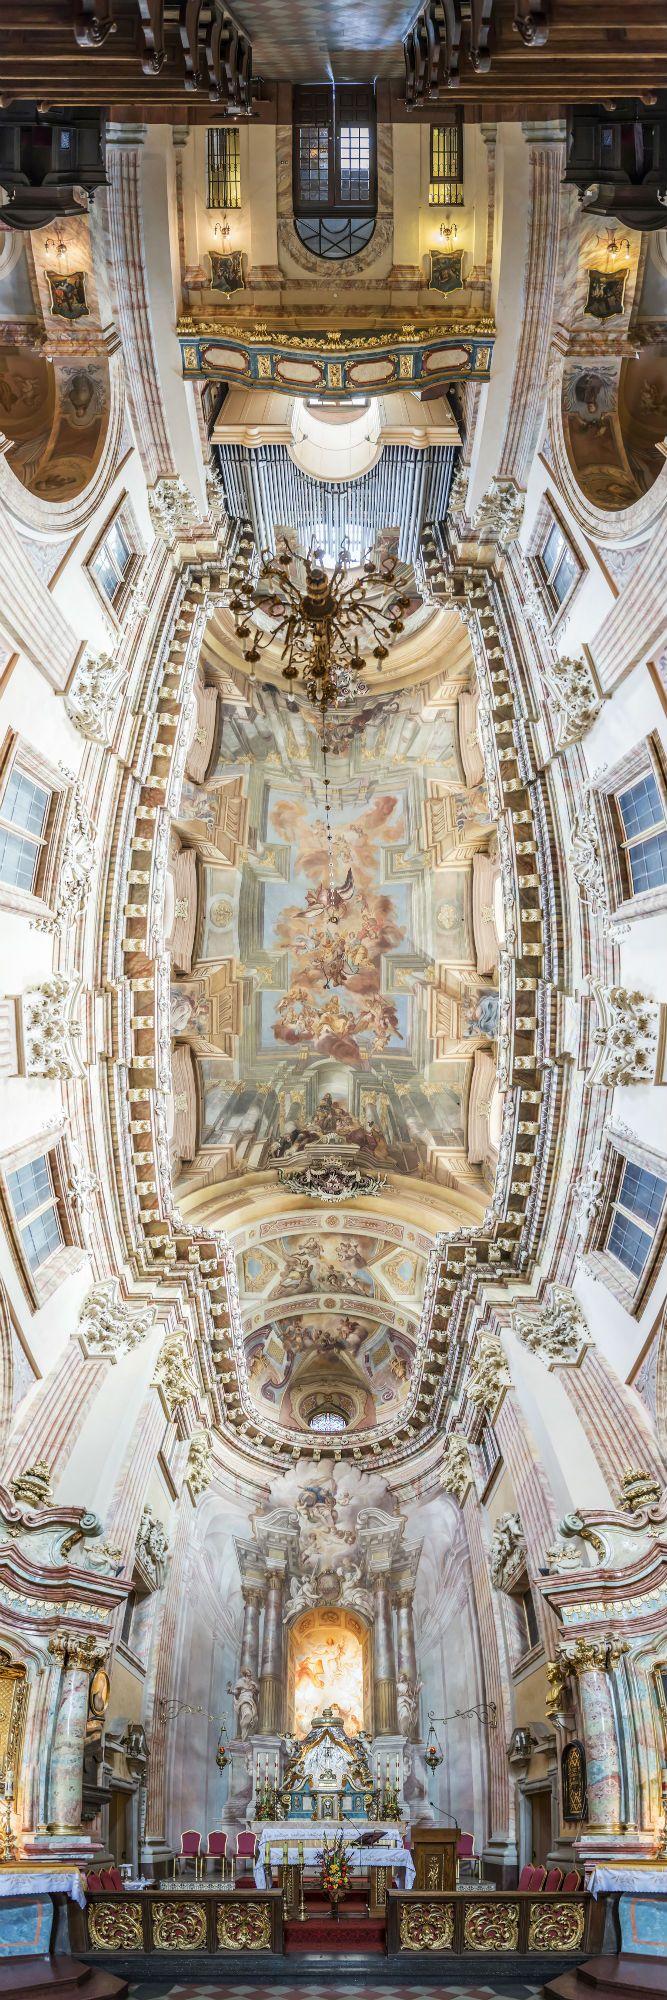 Church of the Transfiguration - Krakow, Poland / Richard Silver